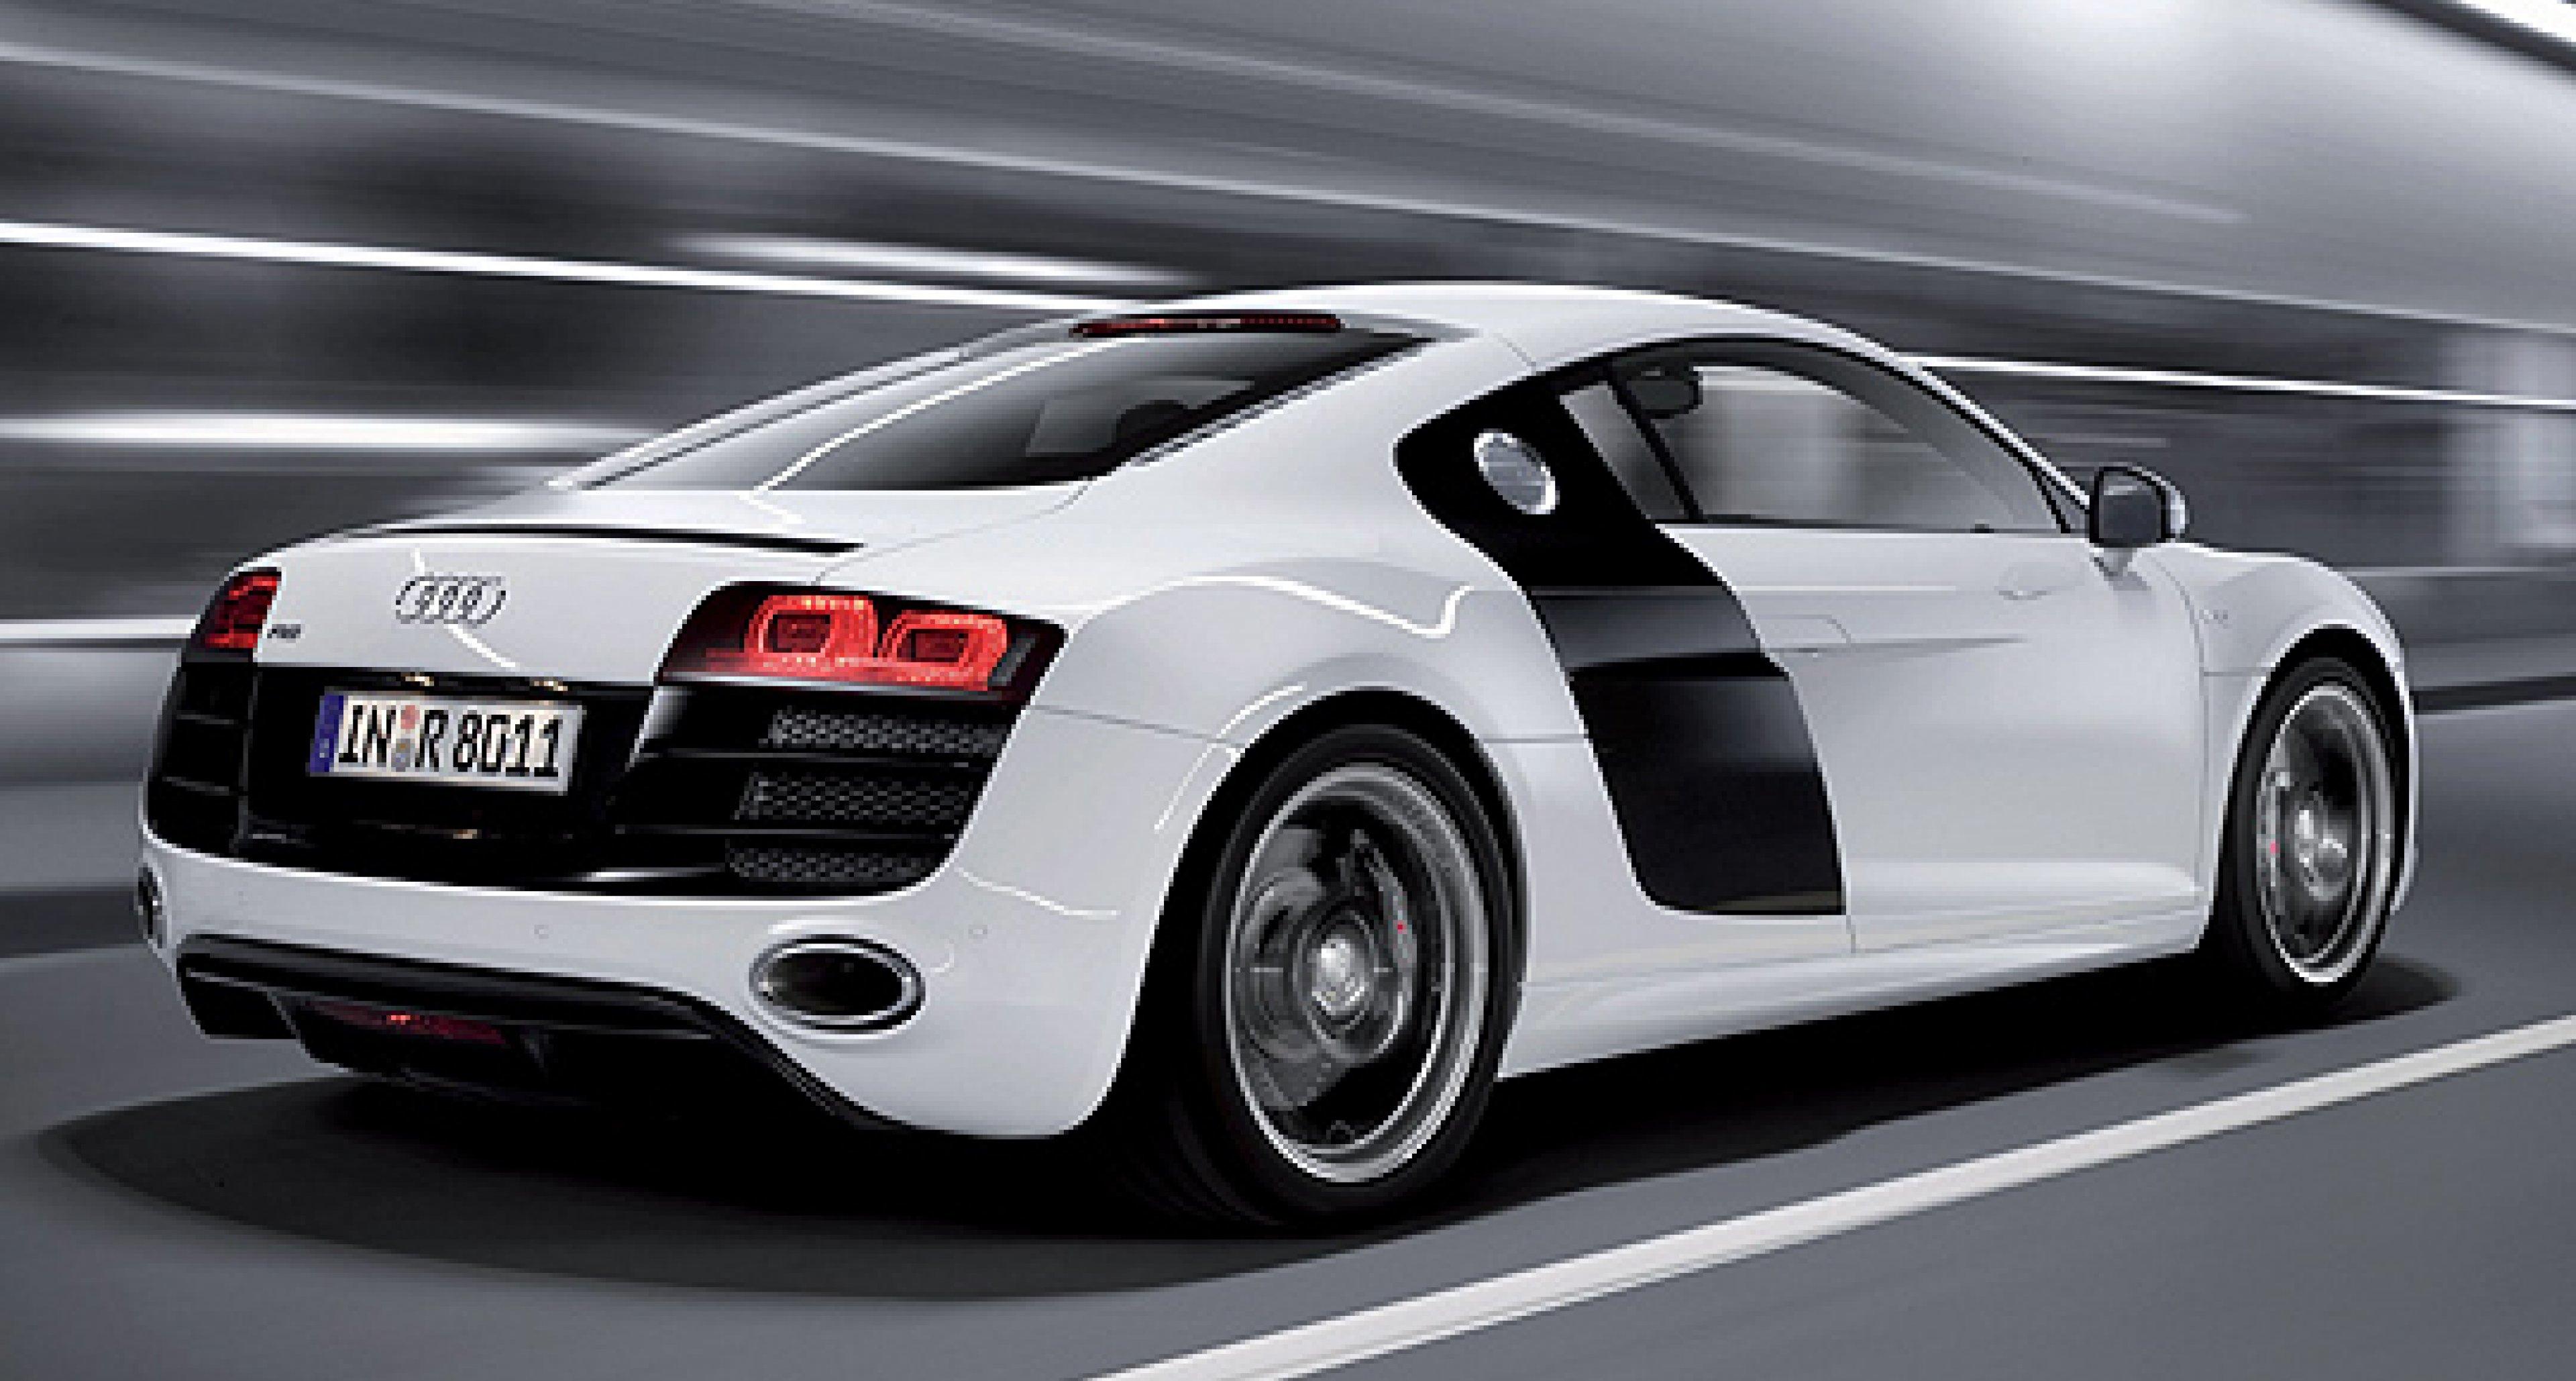 Audi R8: Design Analysis